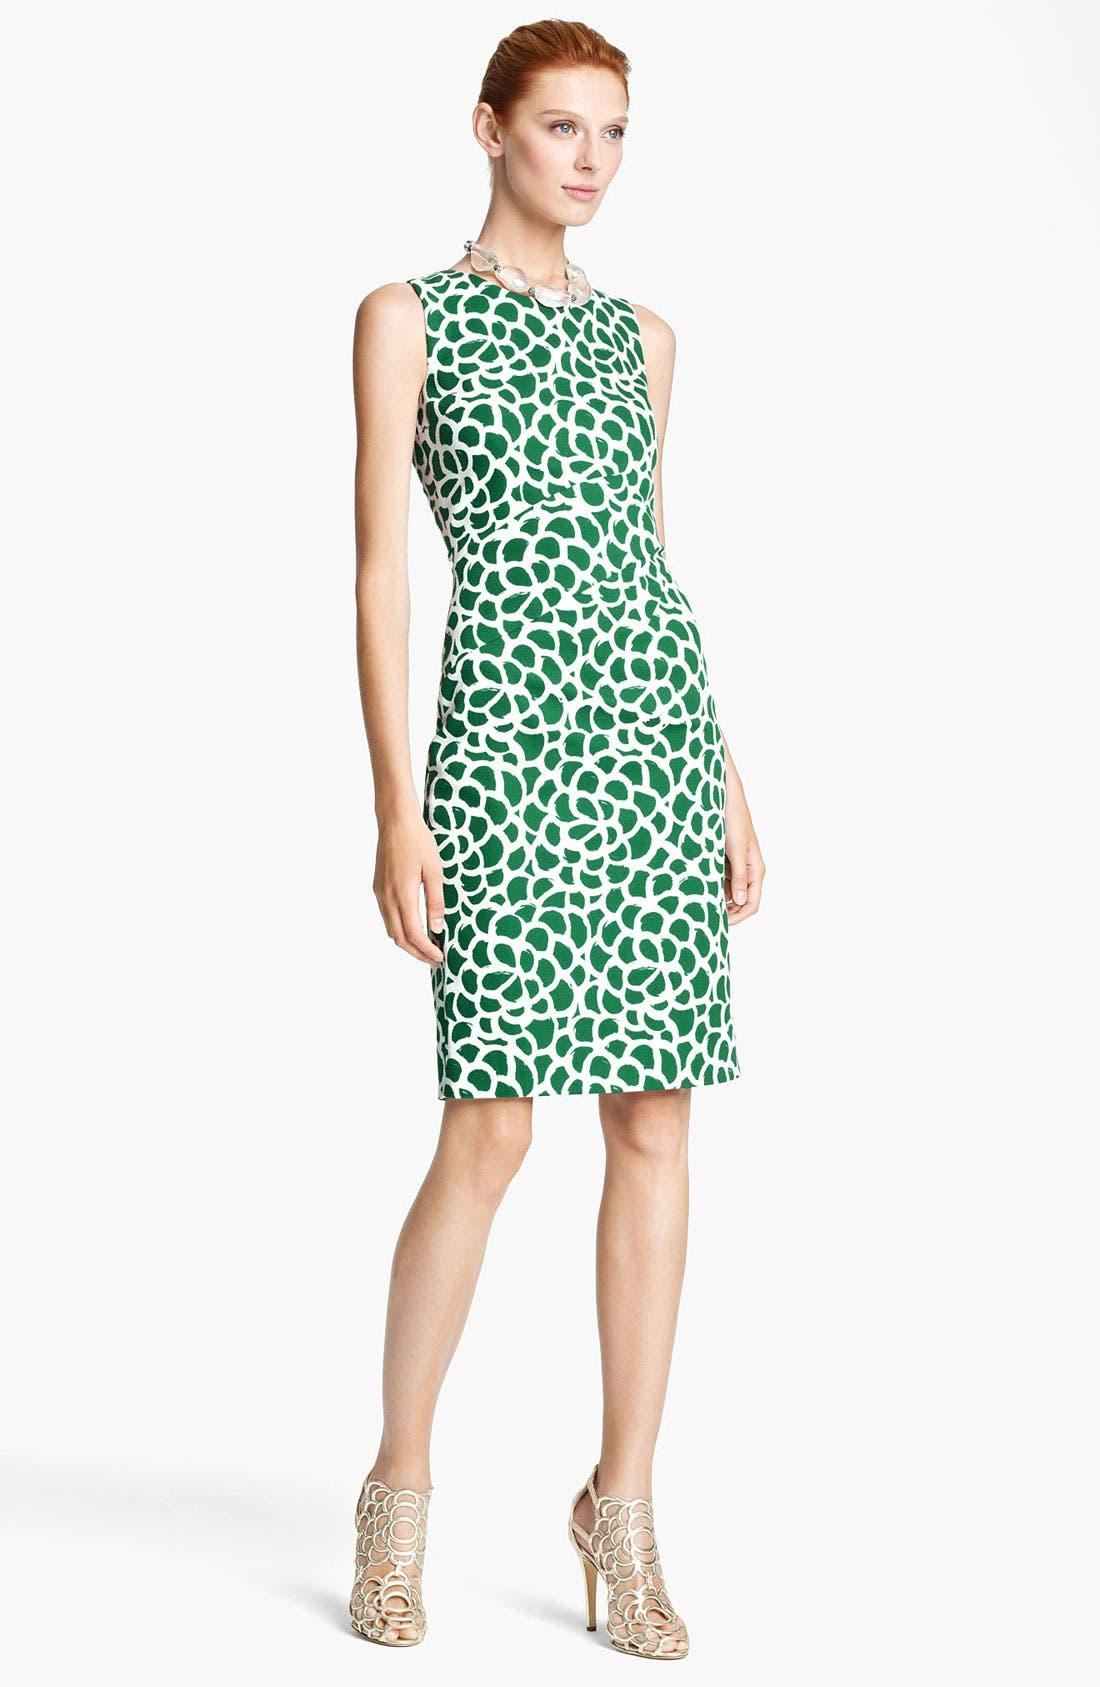 Alternate Image 1 Selected - Oscar de la Renta Print Canvas Dress